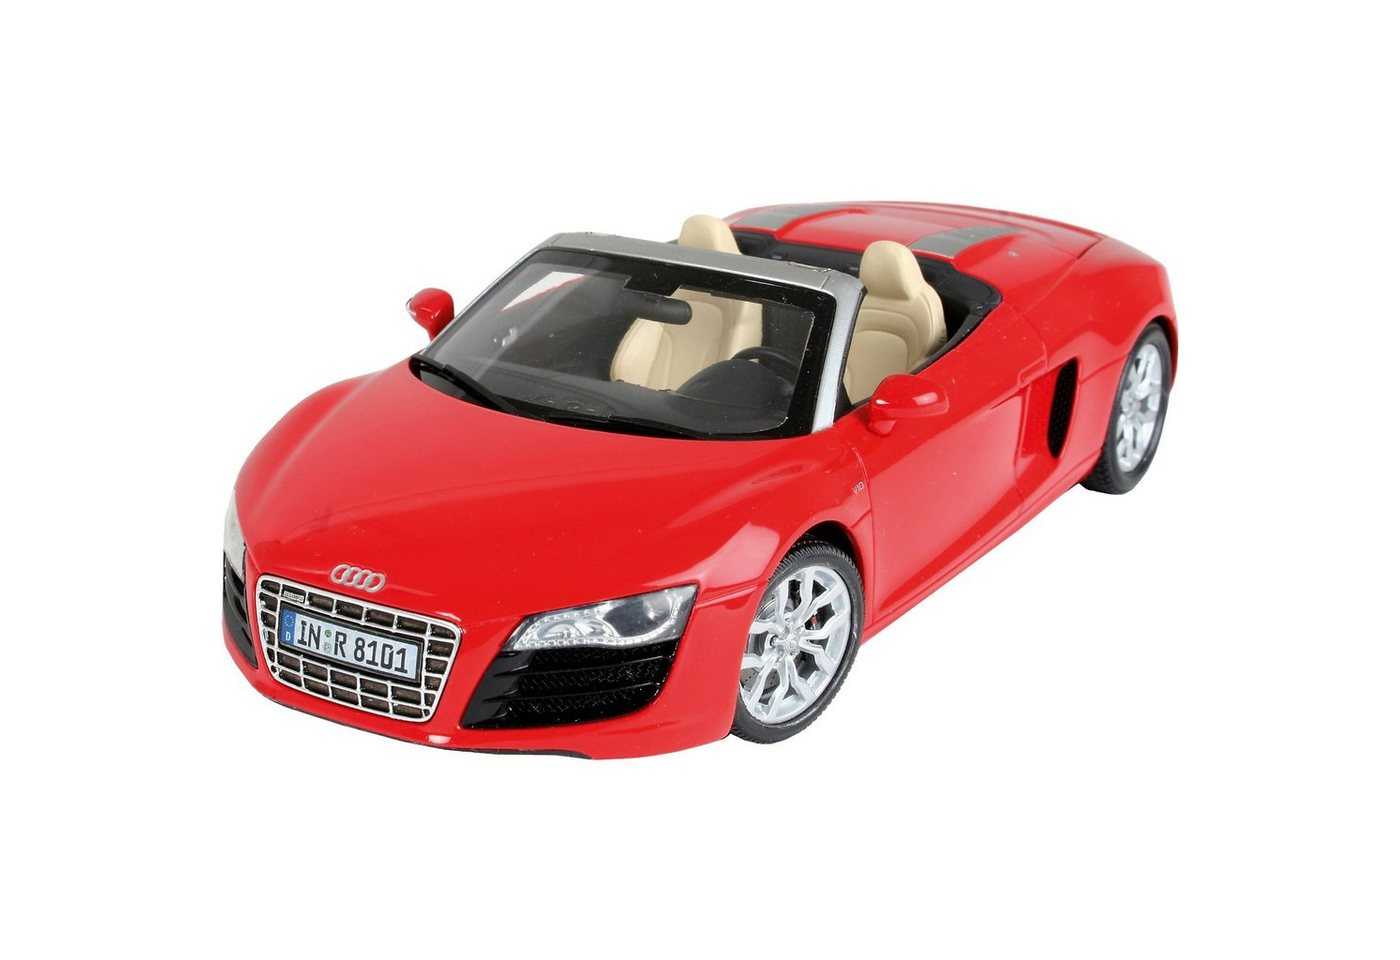 Revell® Modellbausatz Audi R8 Spyder im Maßstab 1:24